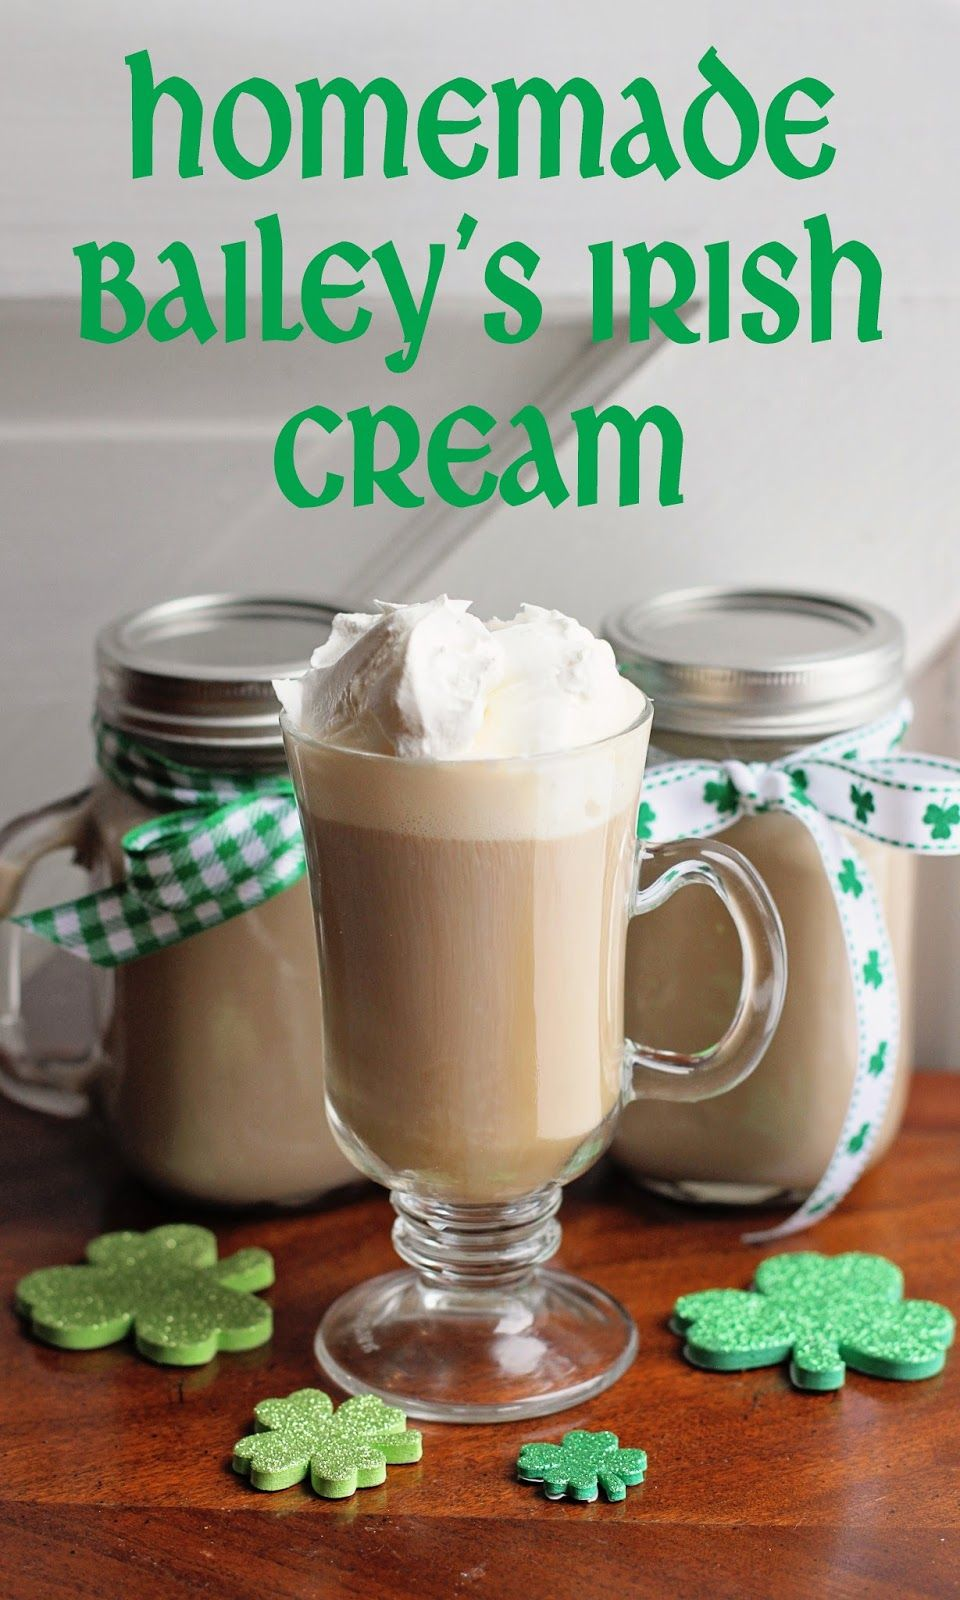 DIY Homemade Bailey's Irish Cream. Super easy!! You'll